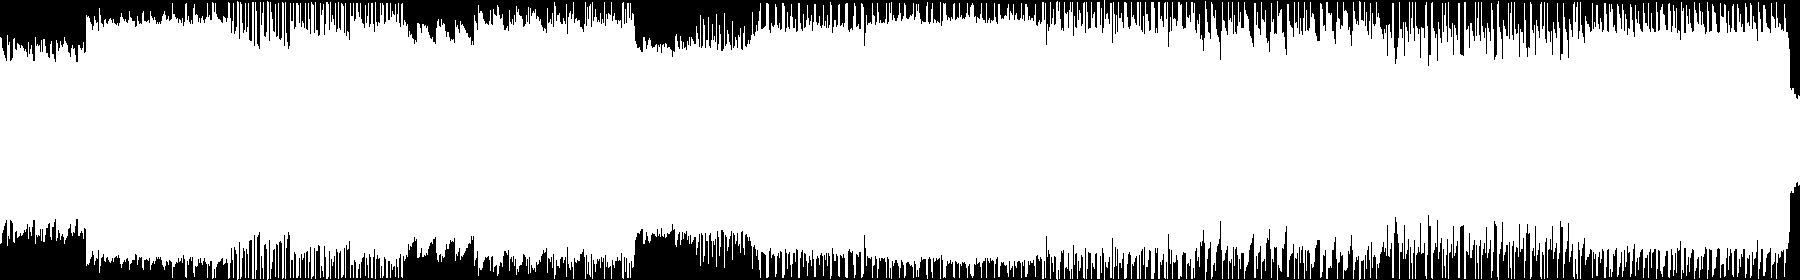 AudioKaviar 03: Chill Hop & Lo-Fi for Ableton Live 10 audio waveform